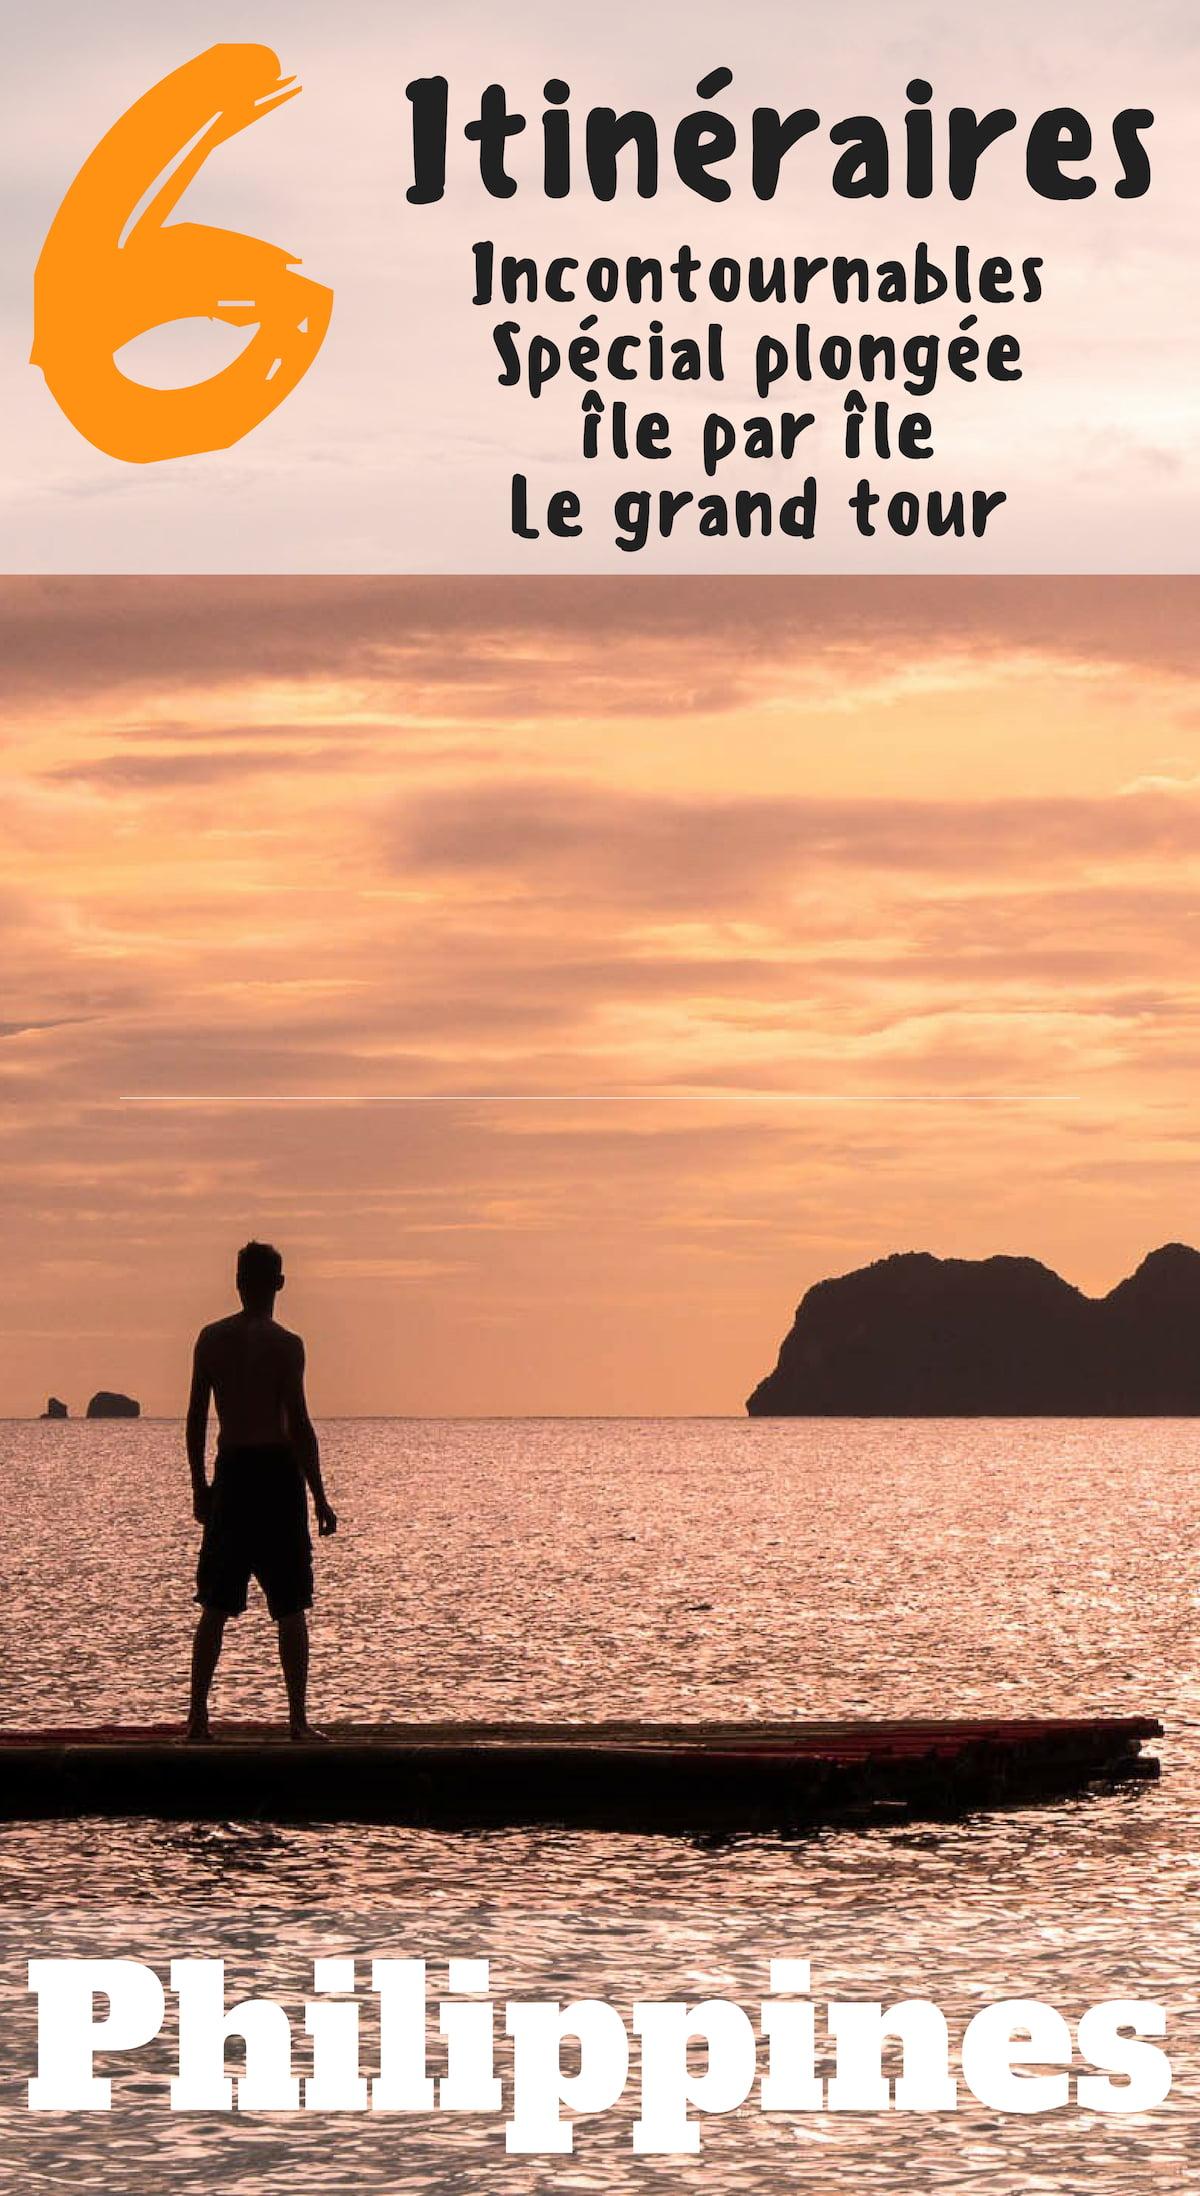 itineraires philippines 1 - Les globe blogueurs - blog voyage nature